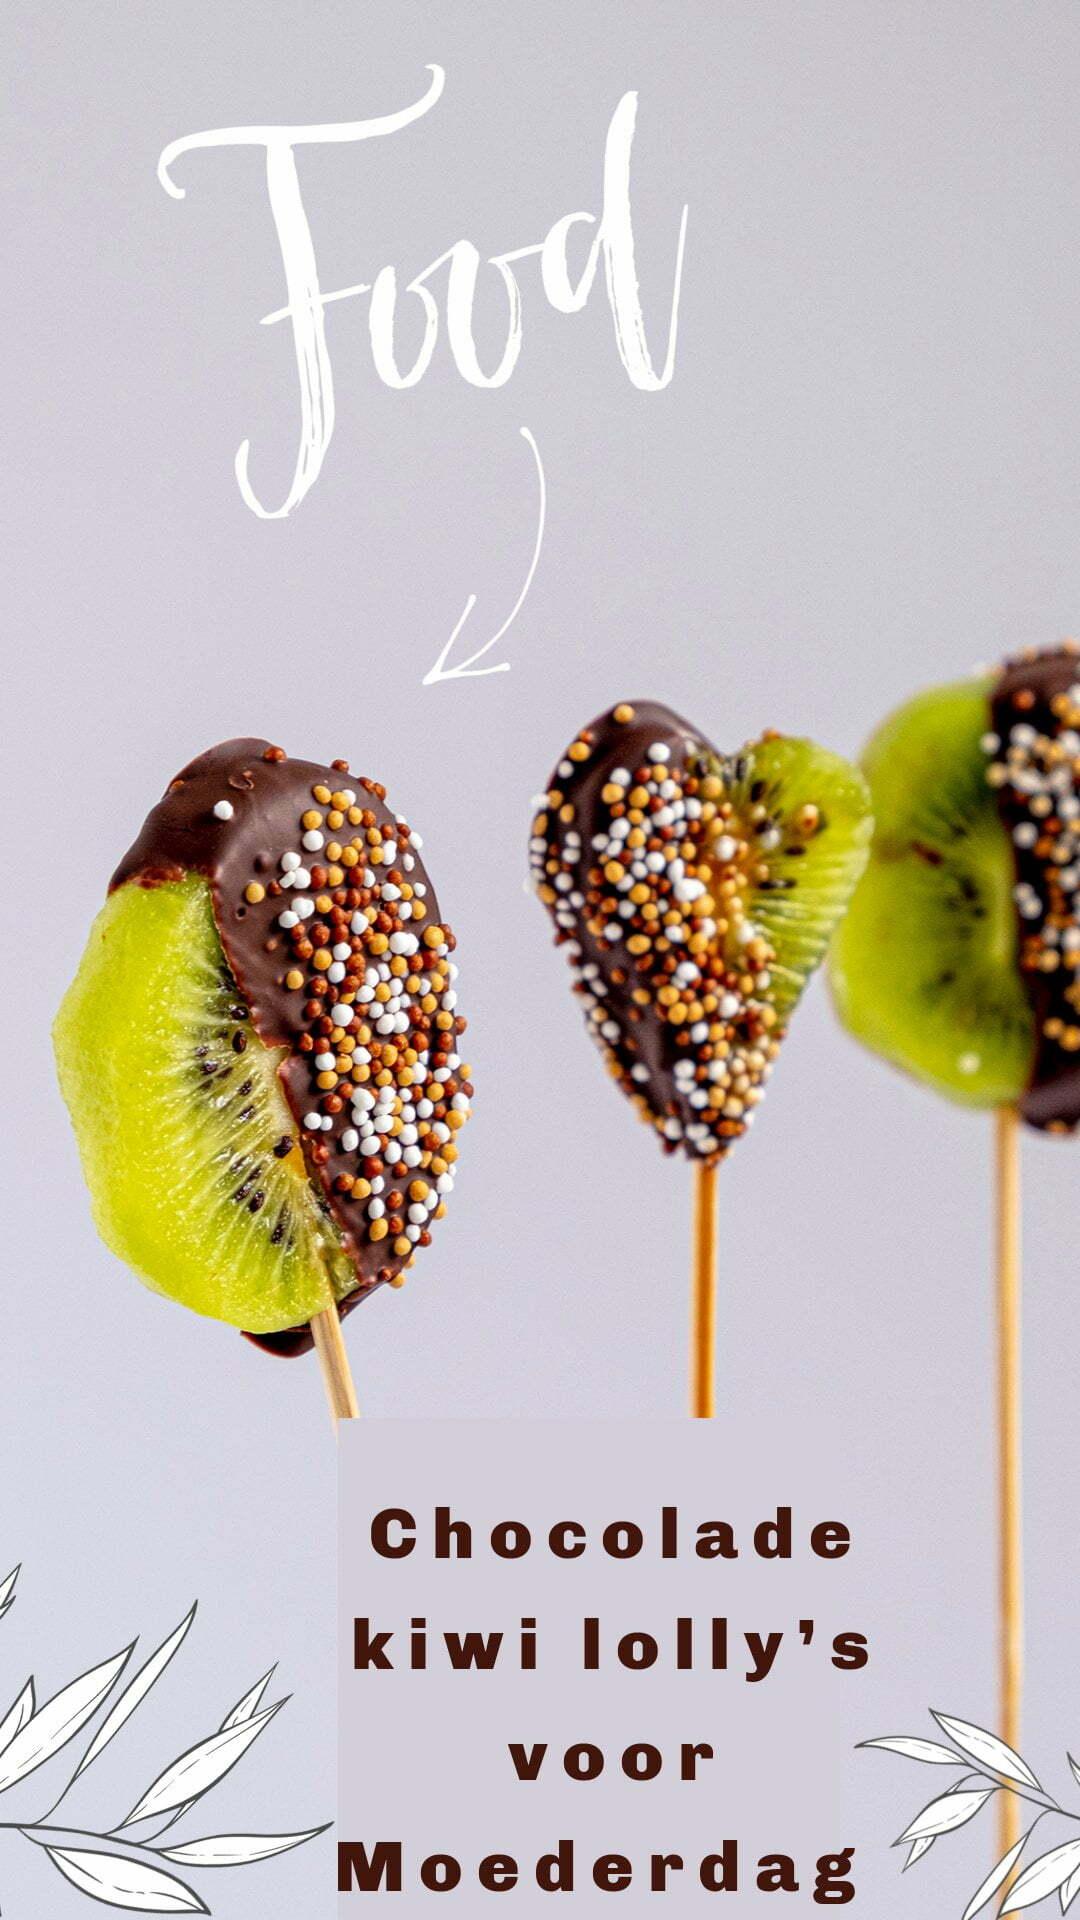 Chocolade kiwi lolly's